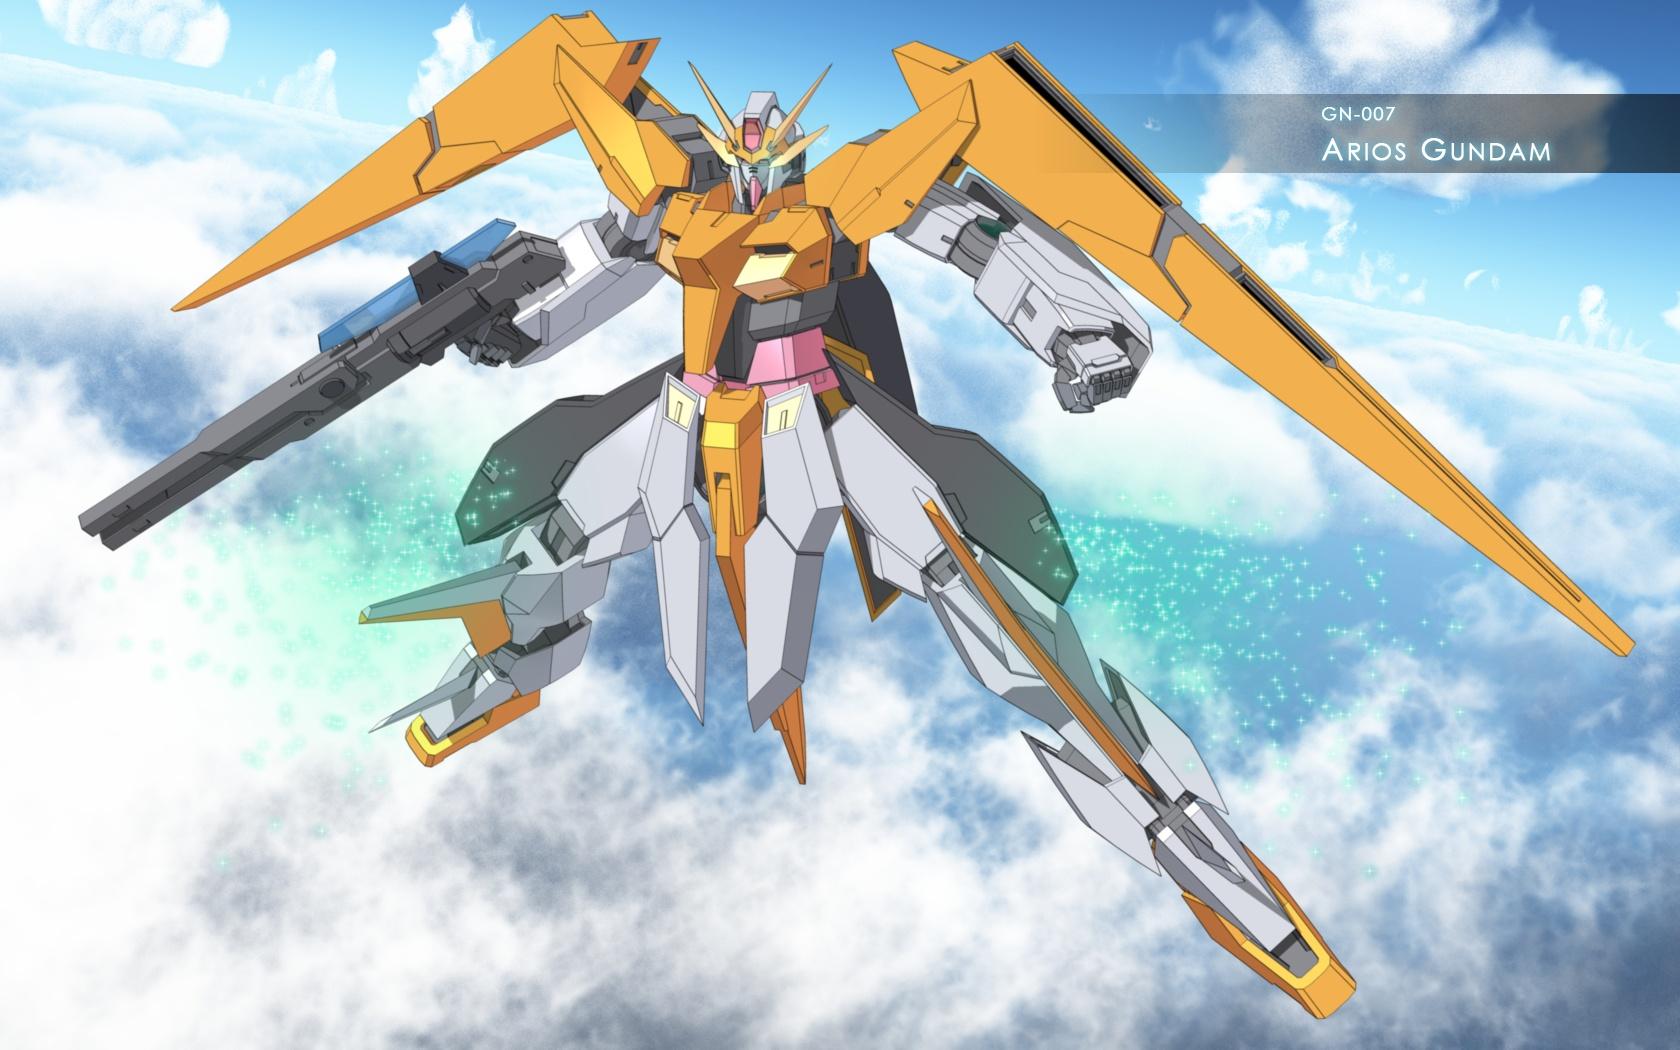 Mobile Suit Gundam 00 Wallpaper Page 5 Zerochan Anime Image Board